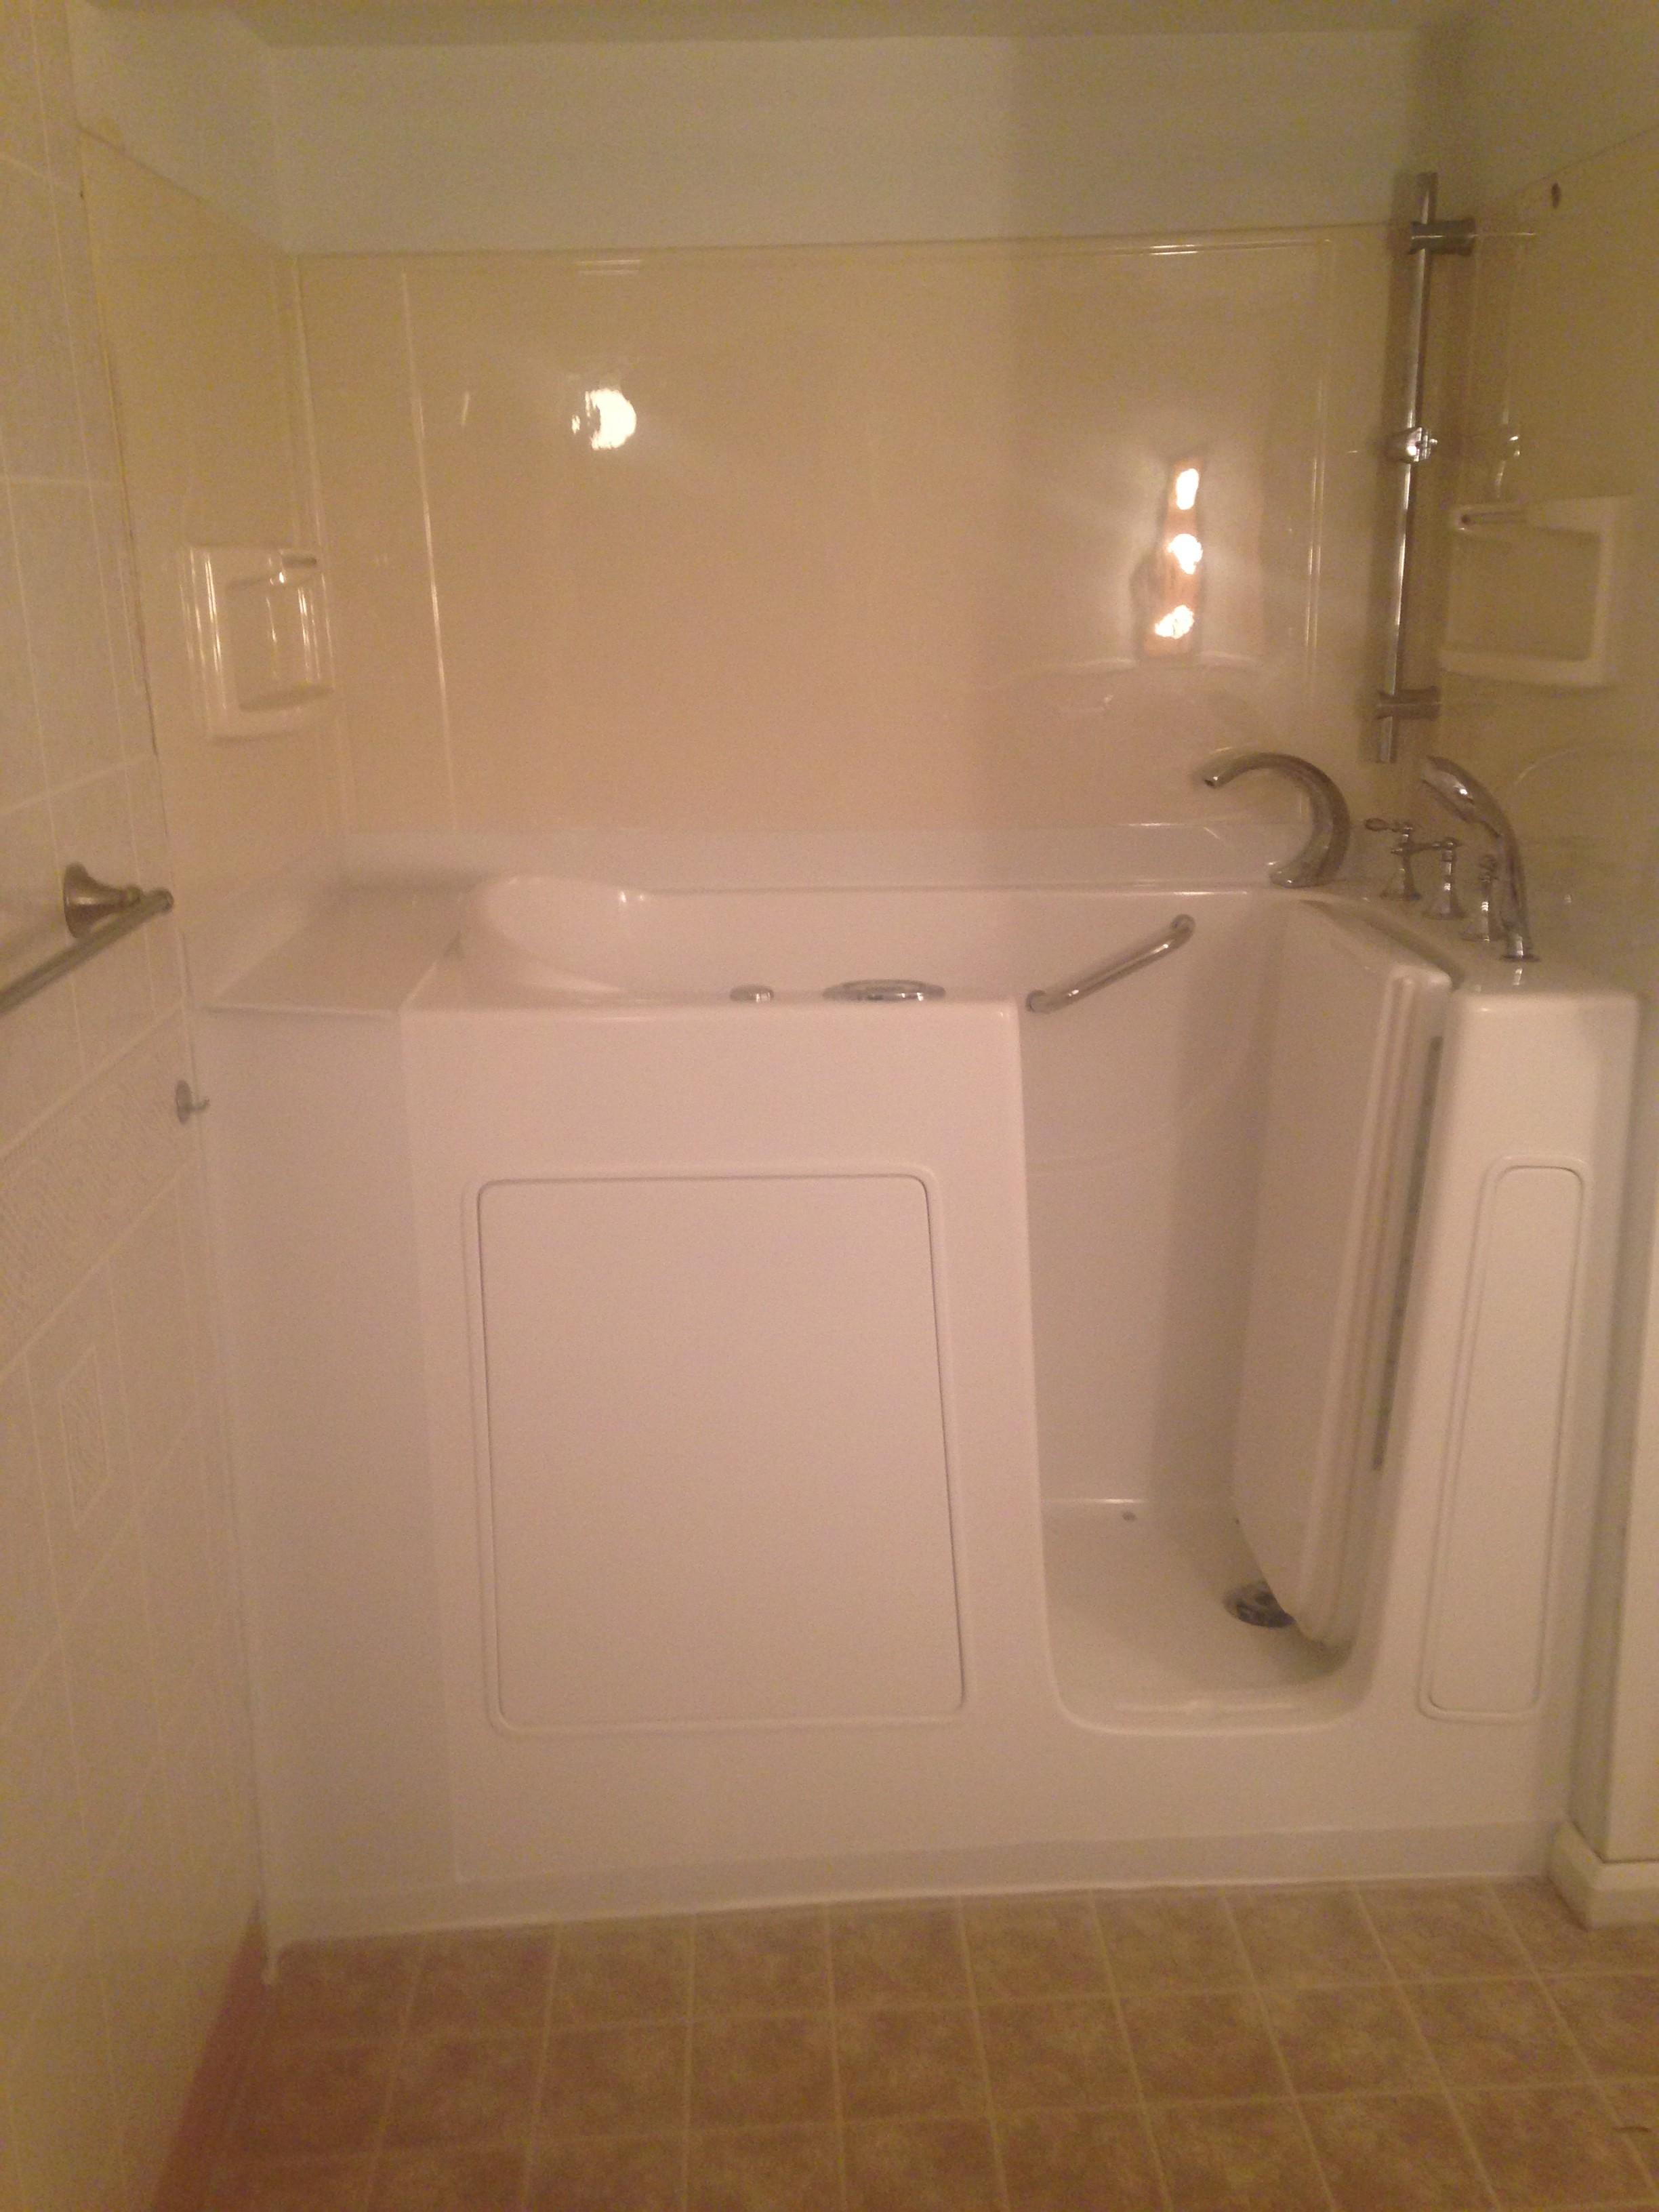 Walk In Bathtub With Grab Bar On Exterior Wall Mansfield Oh Quality Design Renovations Llc